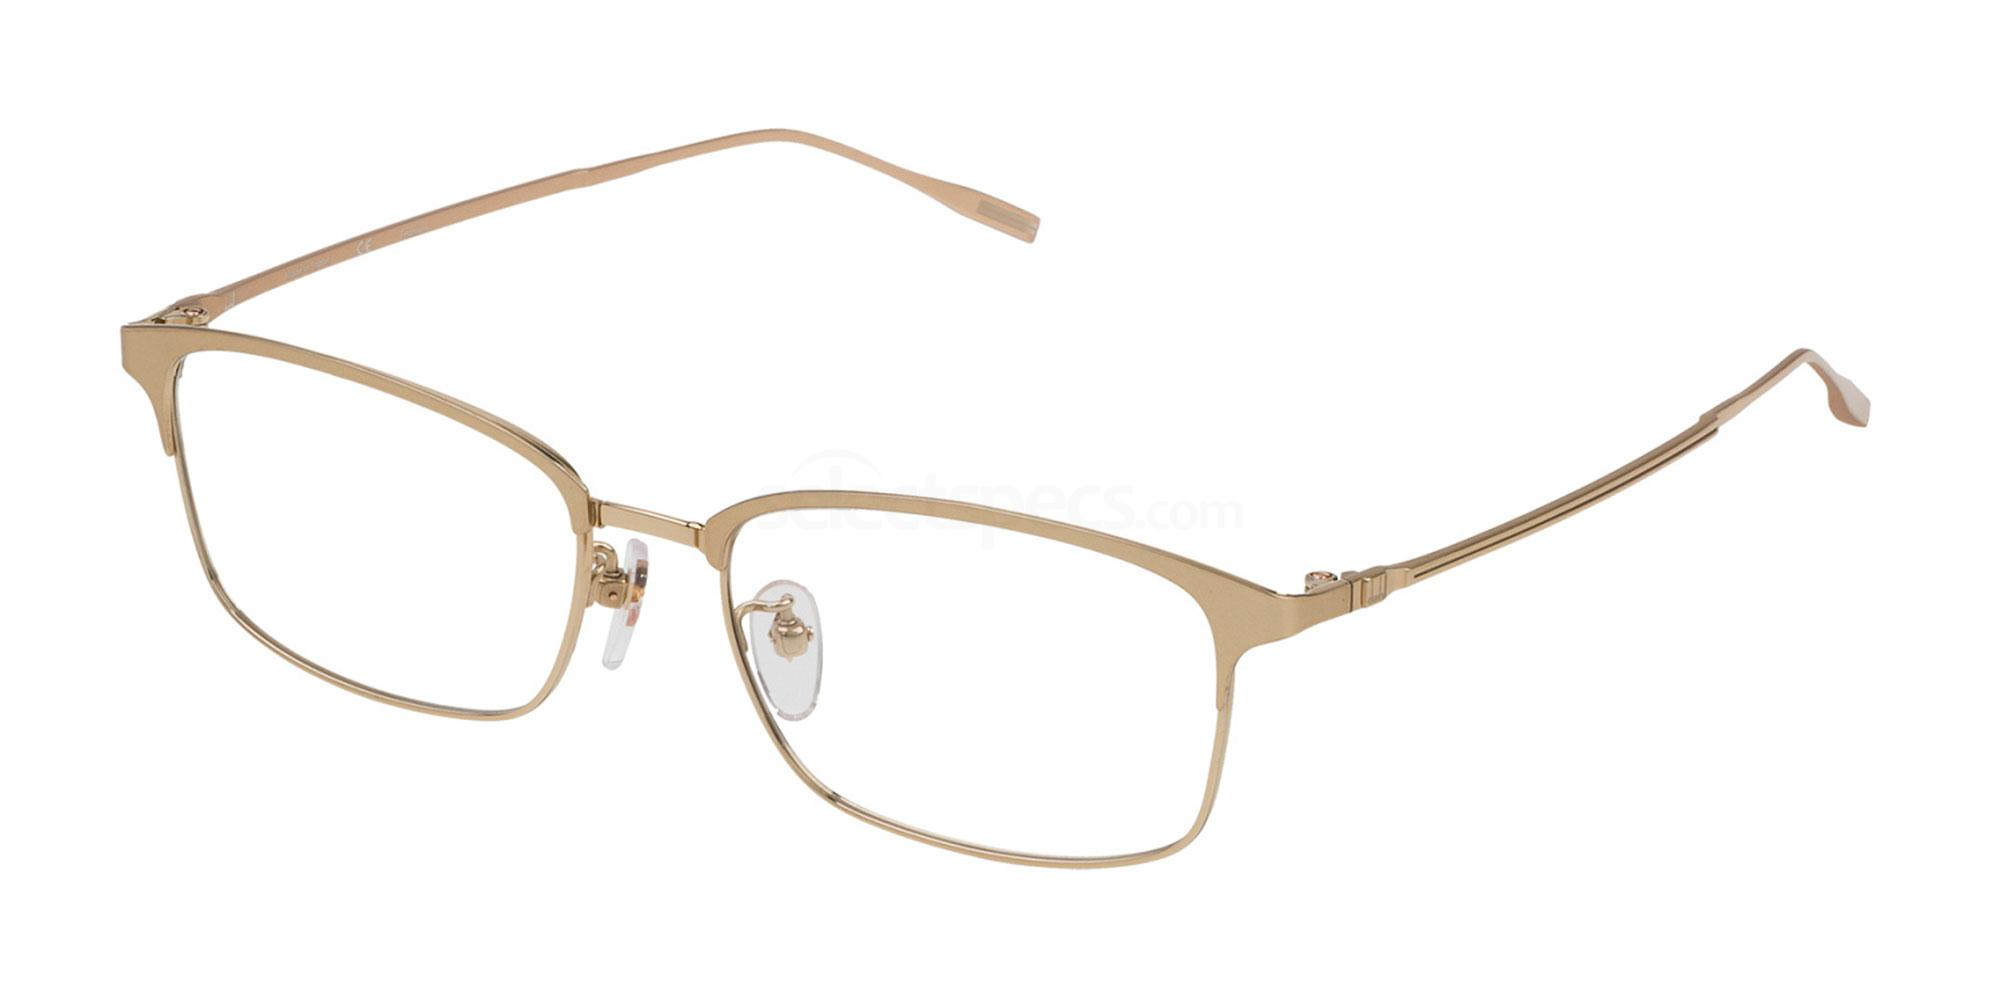 02A8 VDH122 Glasses, Dunhill London